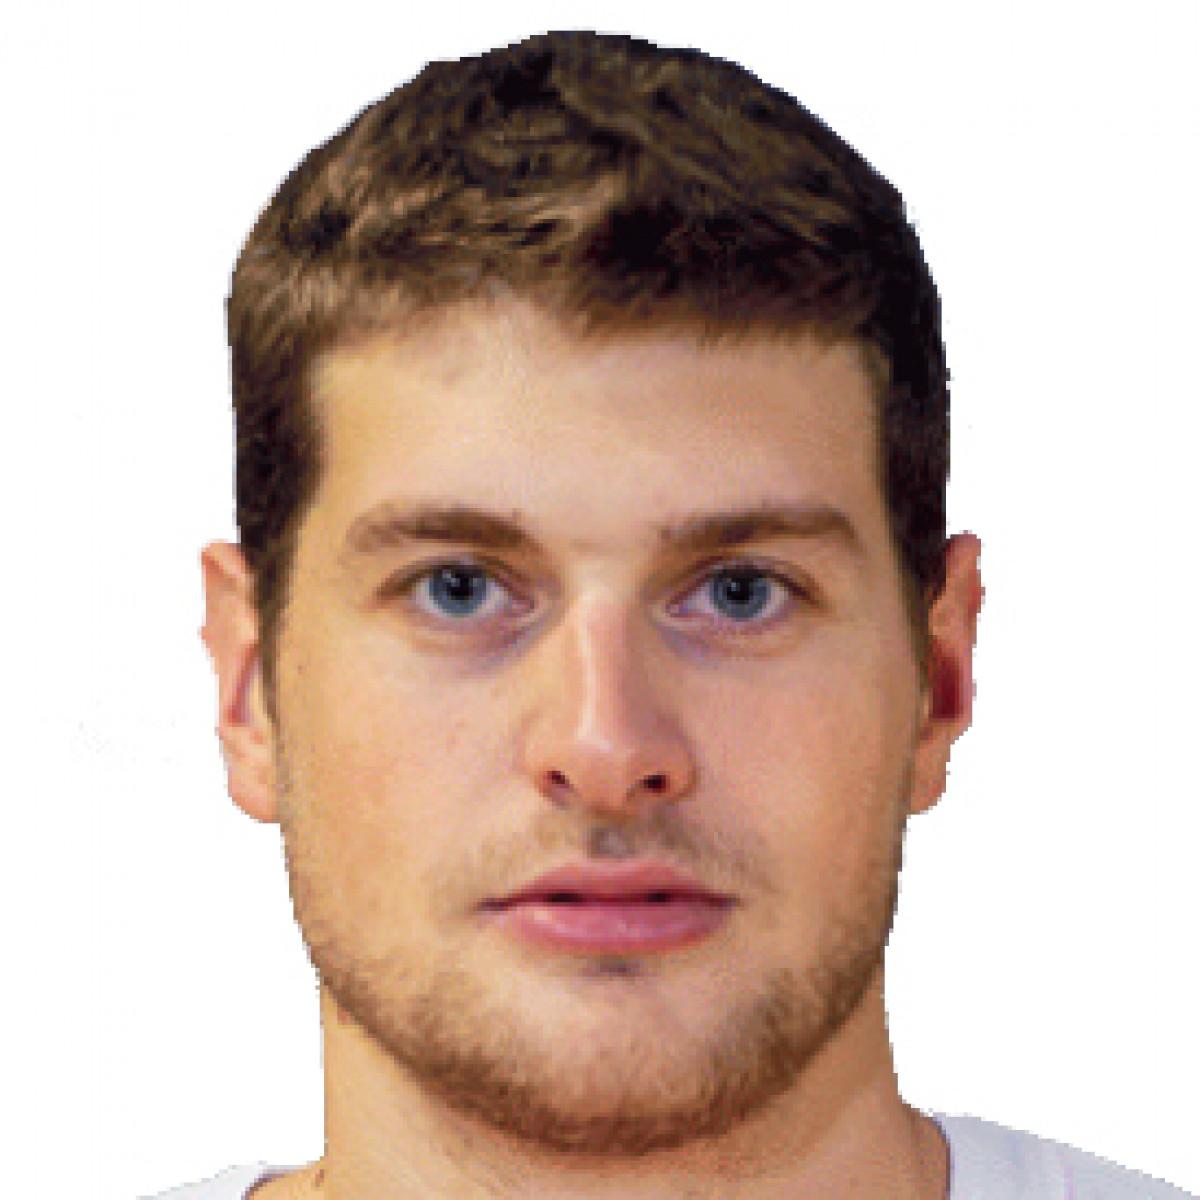 Igor Djukovic